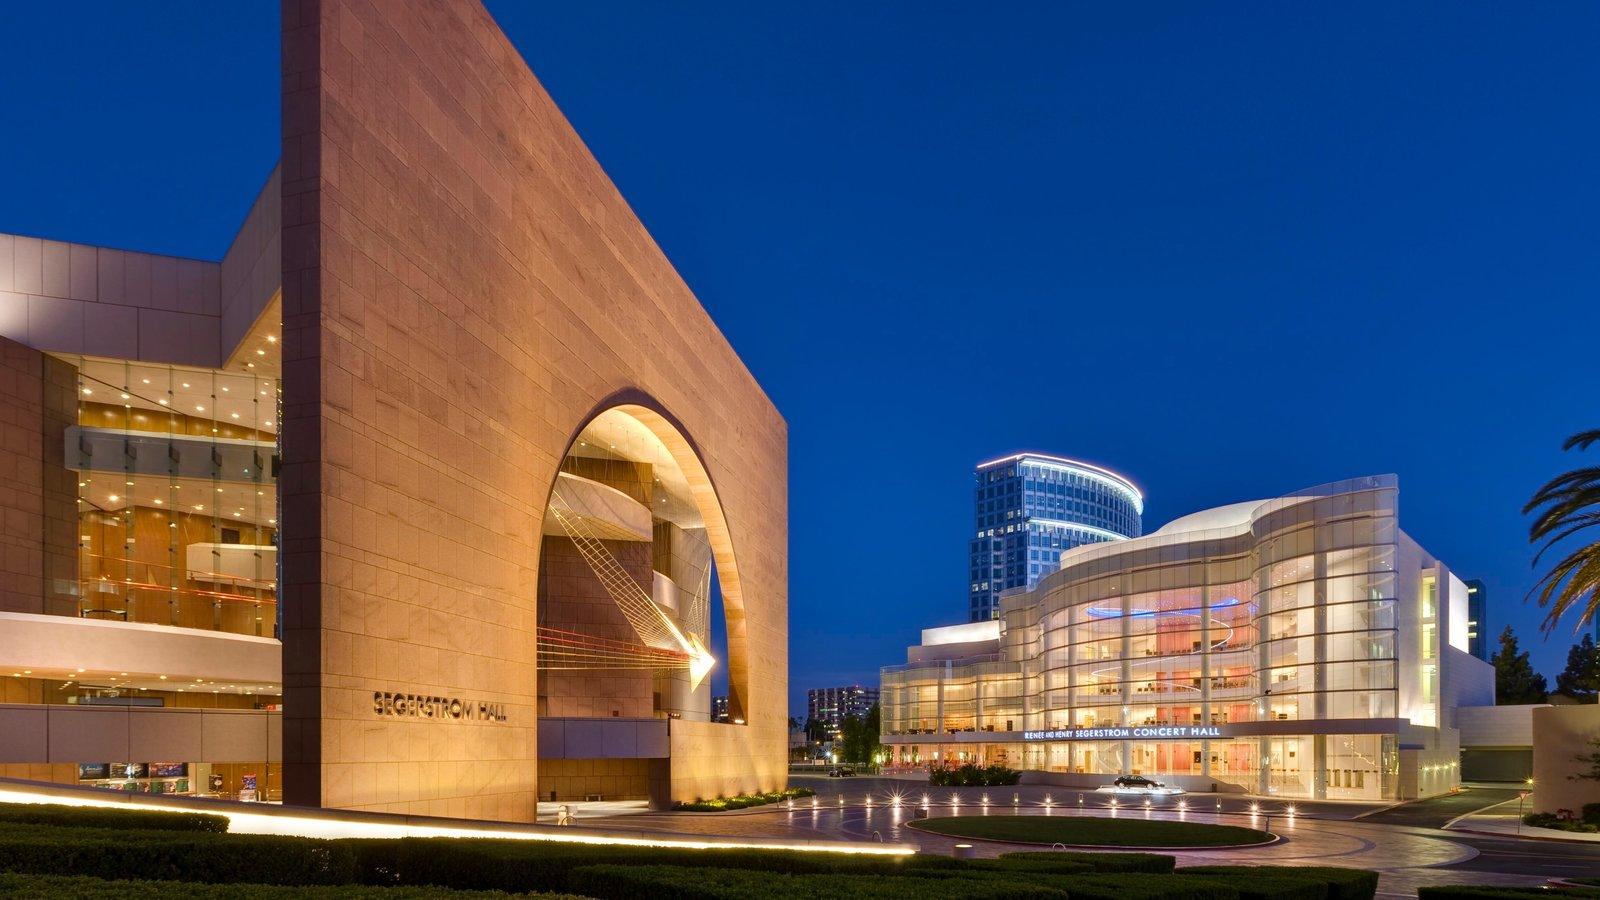 Segerstrom Center for the Arts mostrando un parque o plaza, horizonte y arte